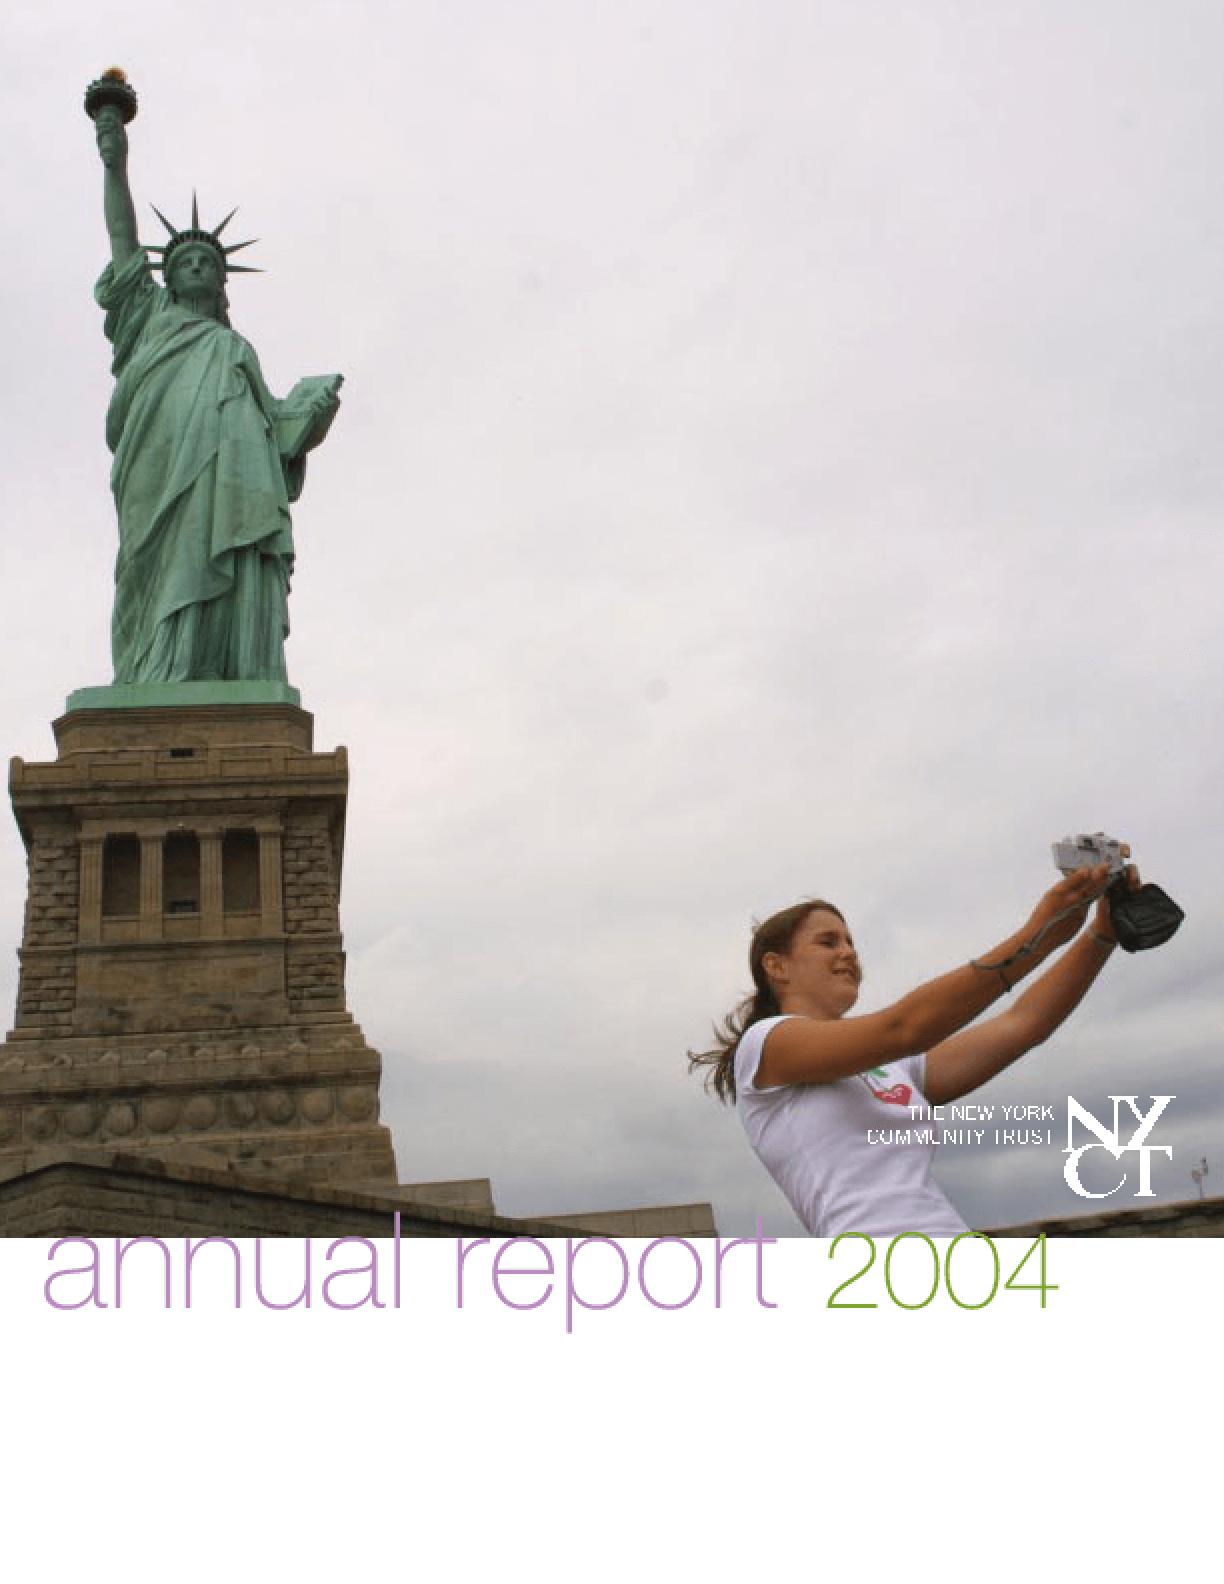 New York Community Trust - 2004 Annual Report